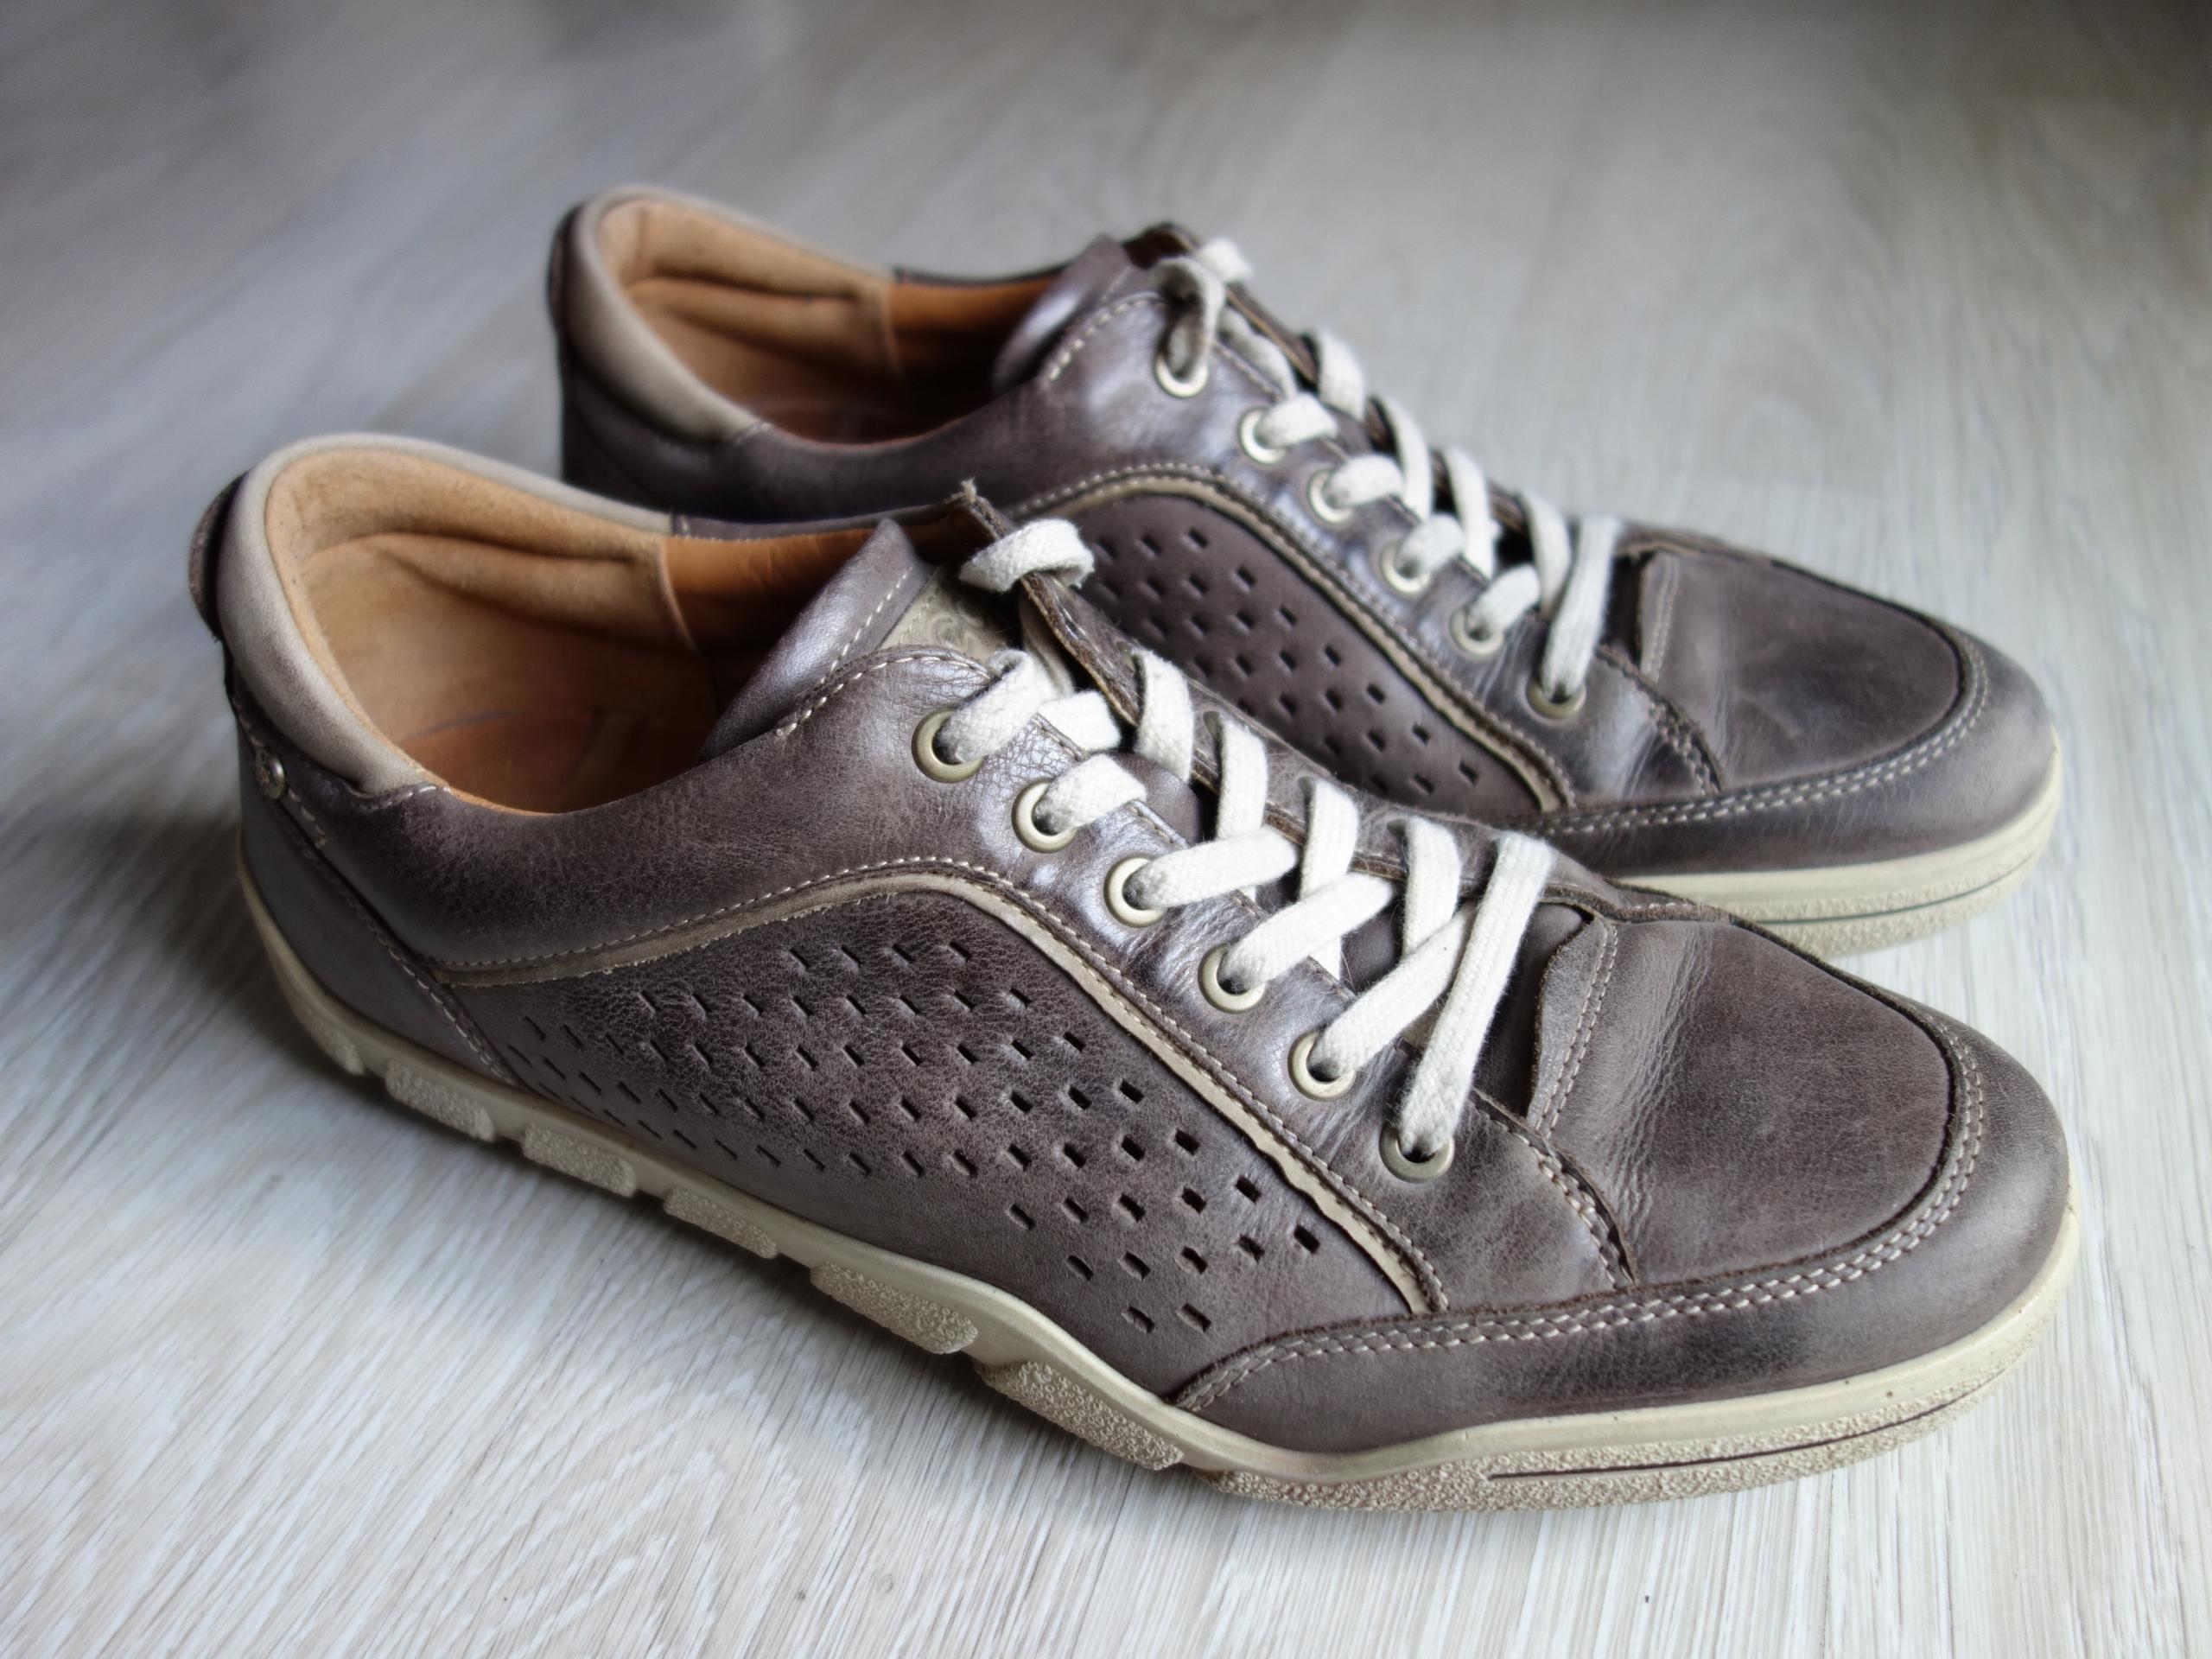 ECCO skórzane sneakers półbuty męskie r 43